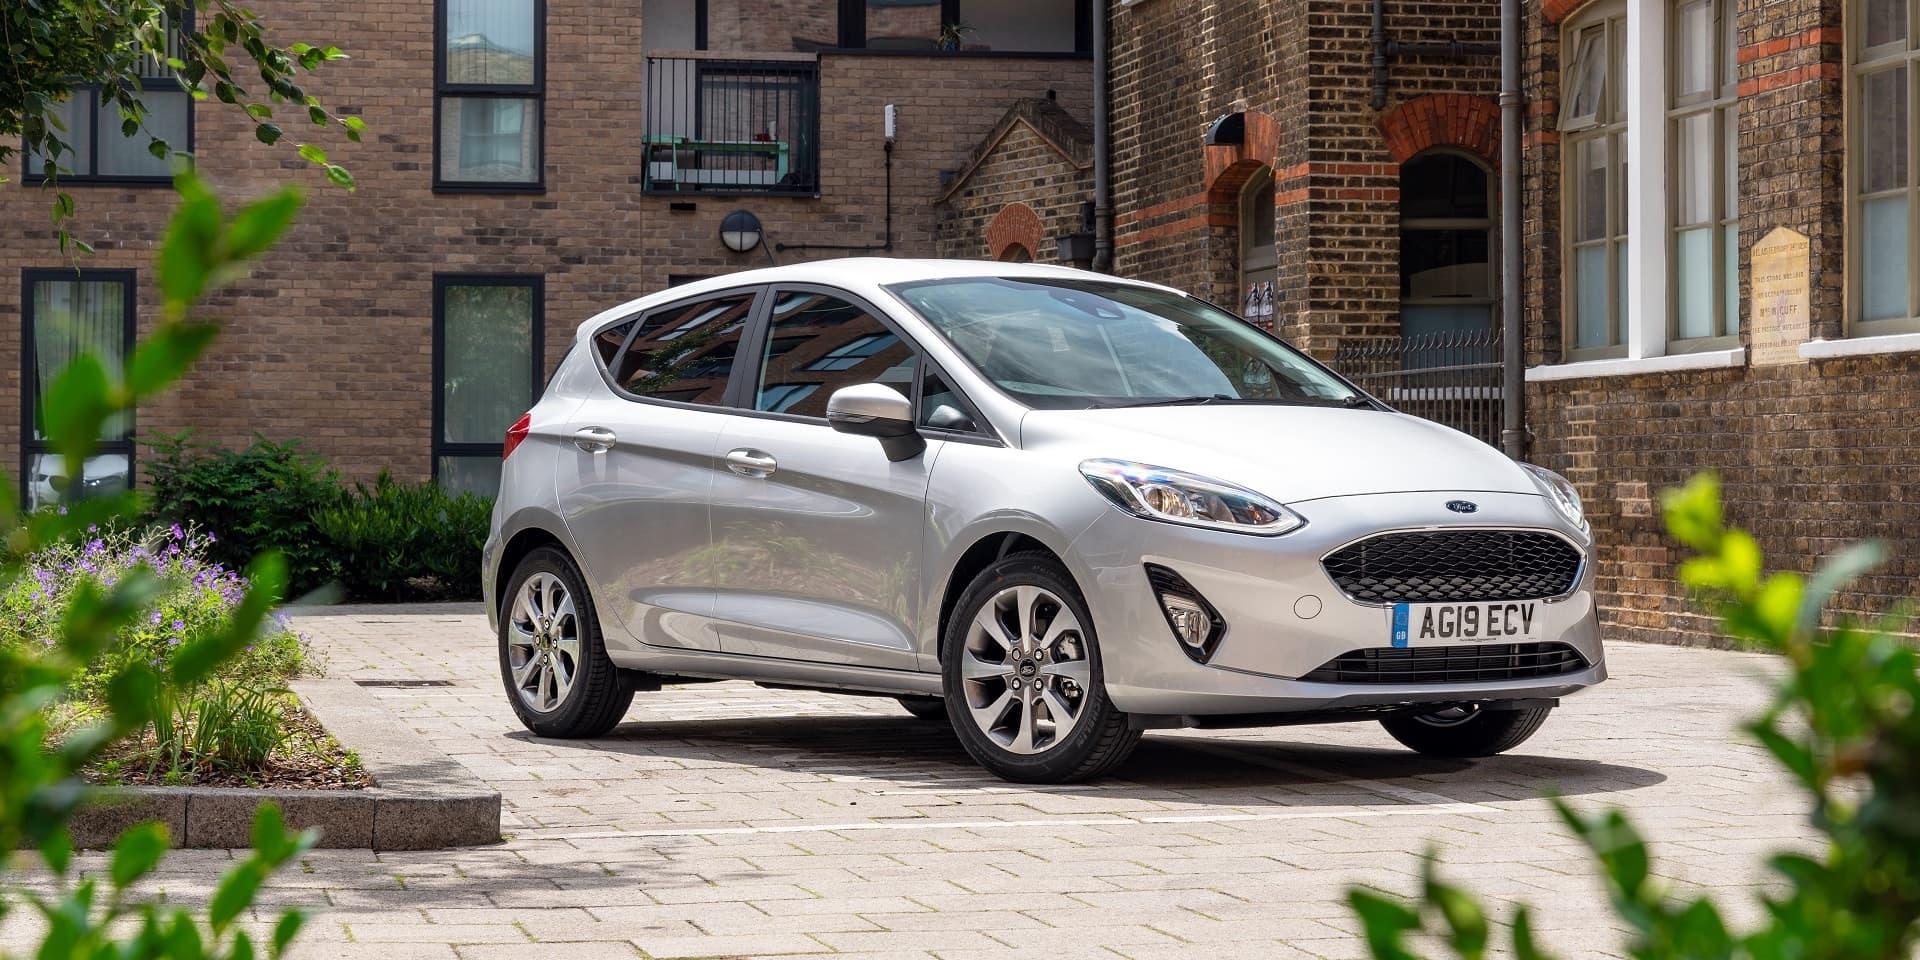 Ford Fiesta (2017 onwards) Expert Rating